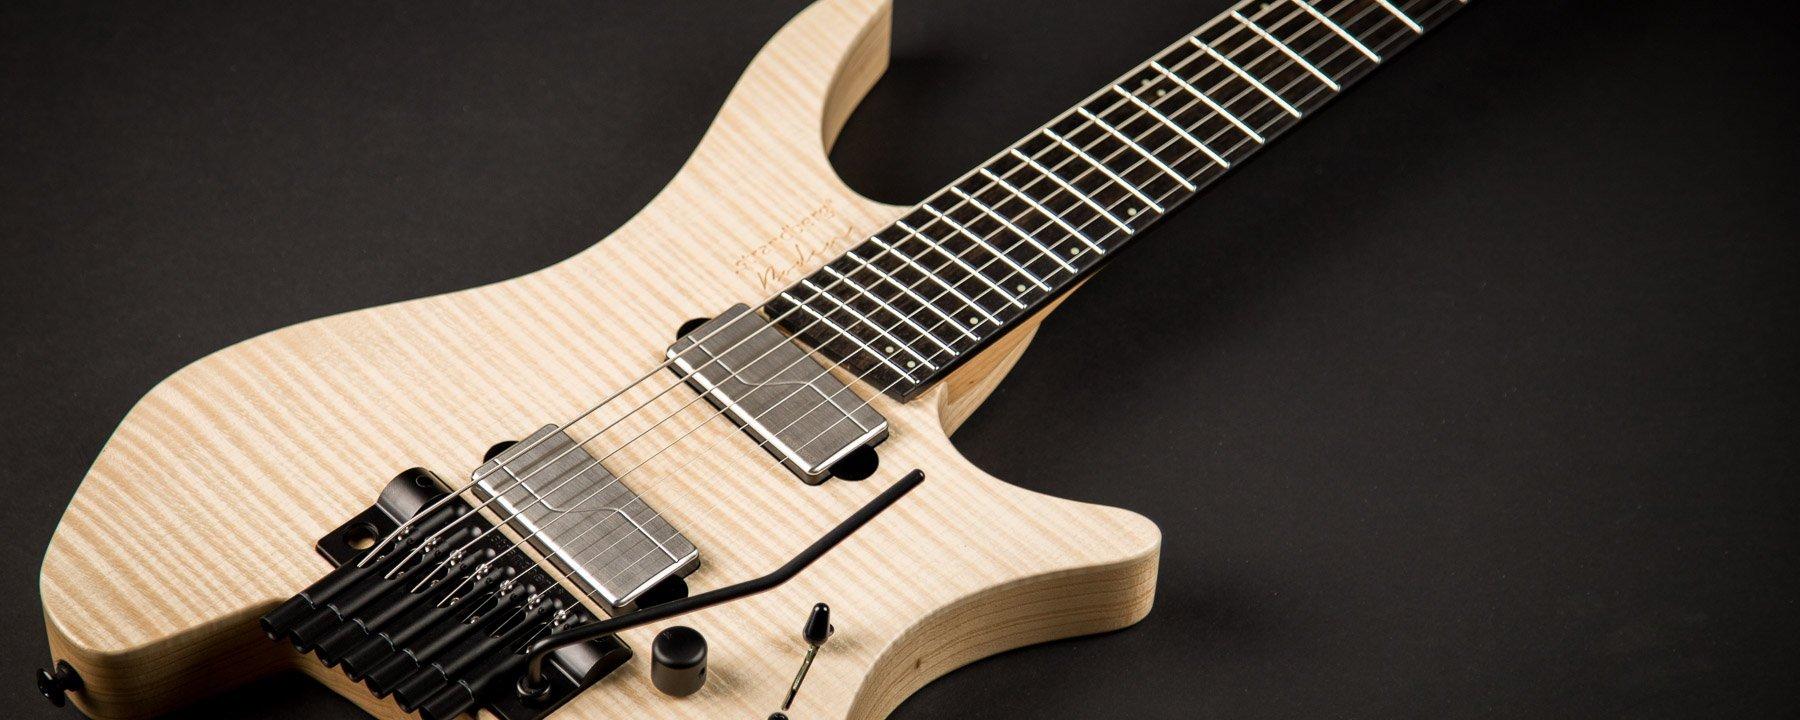 Headless guitar prog natural 7 string